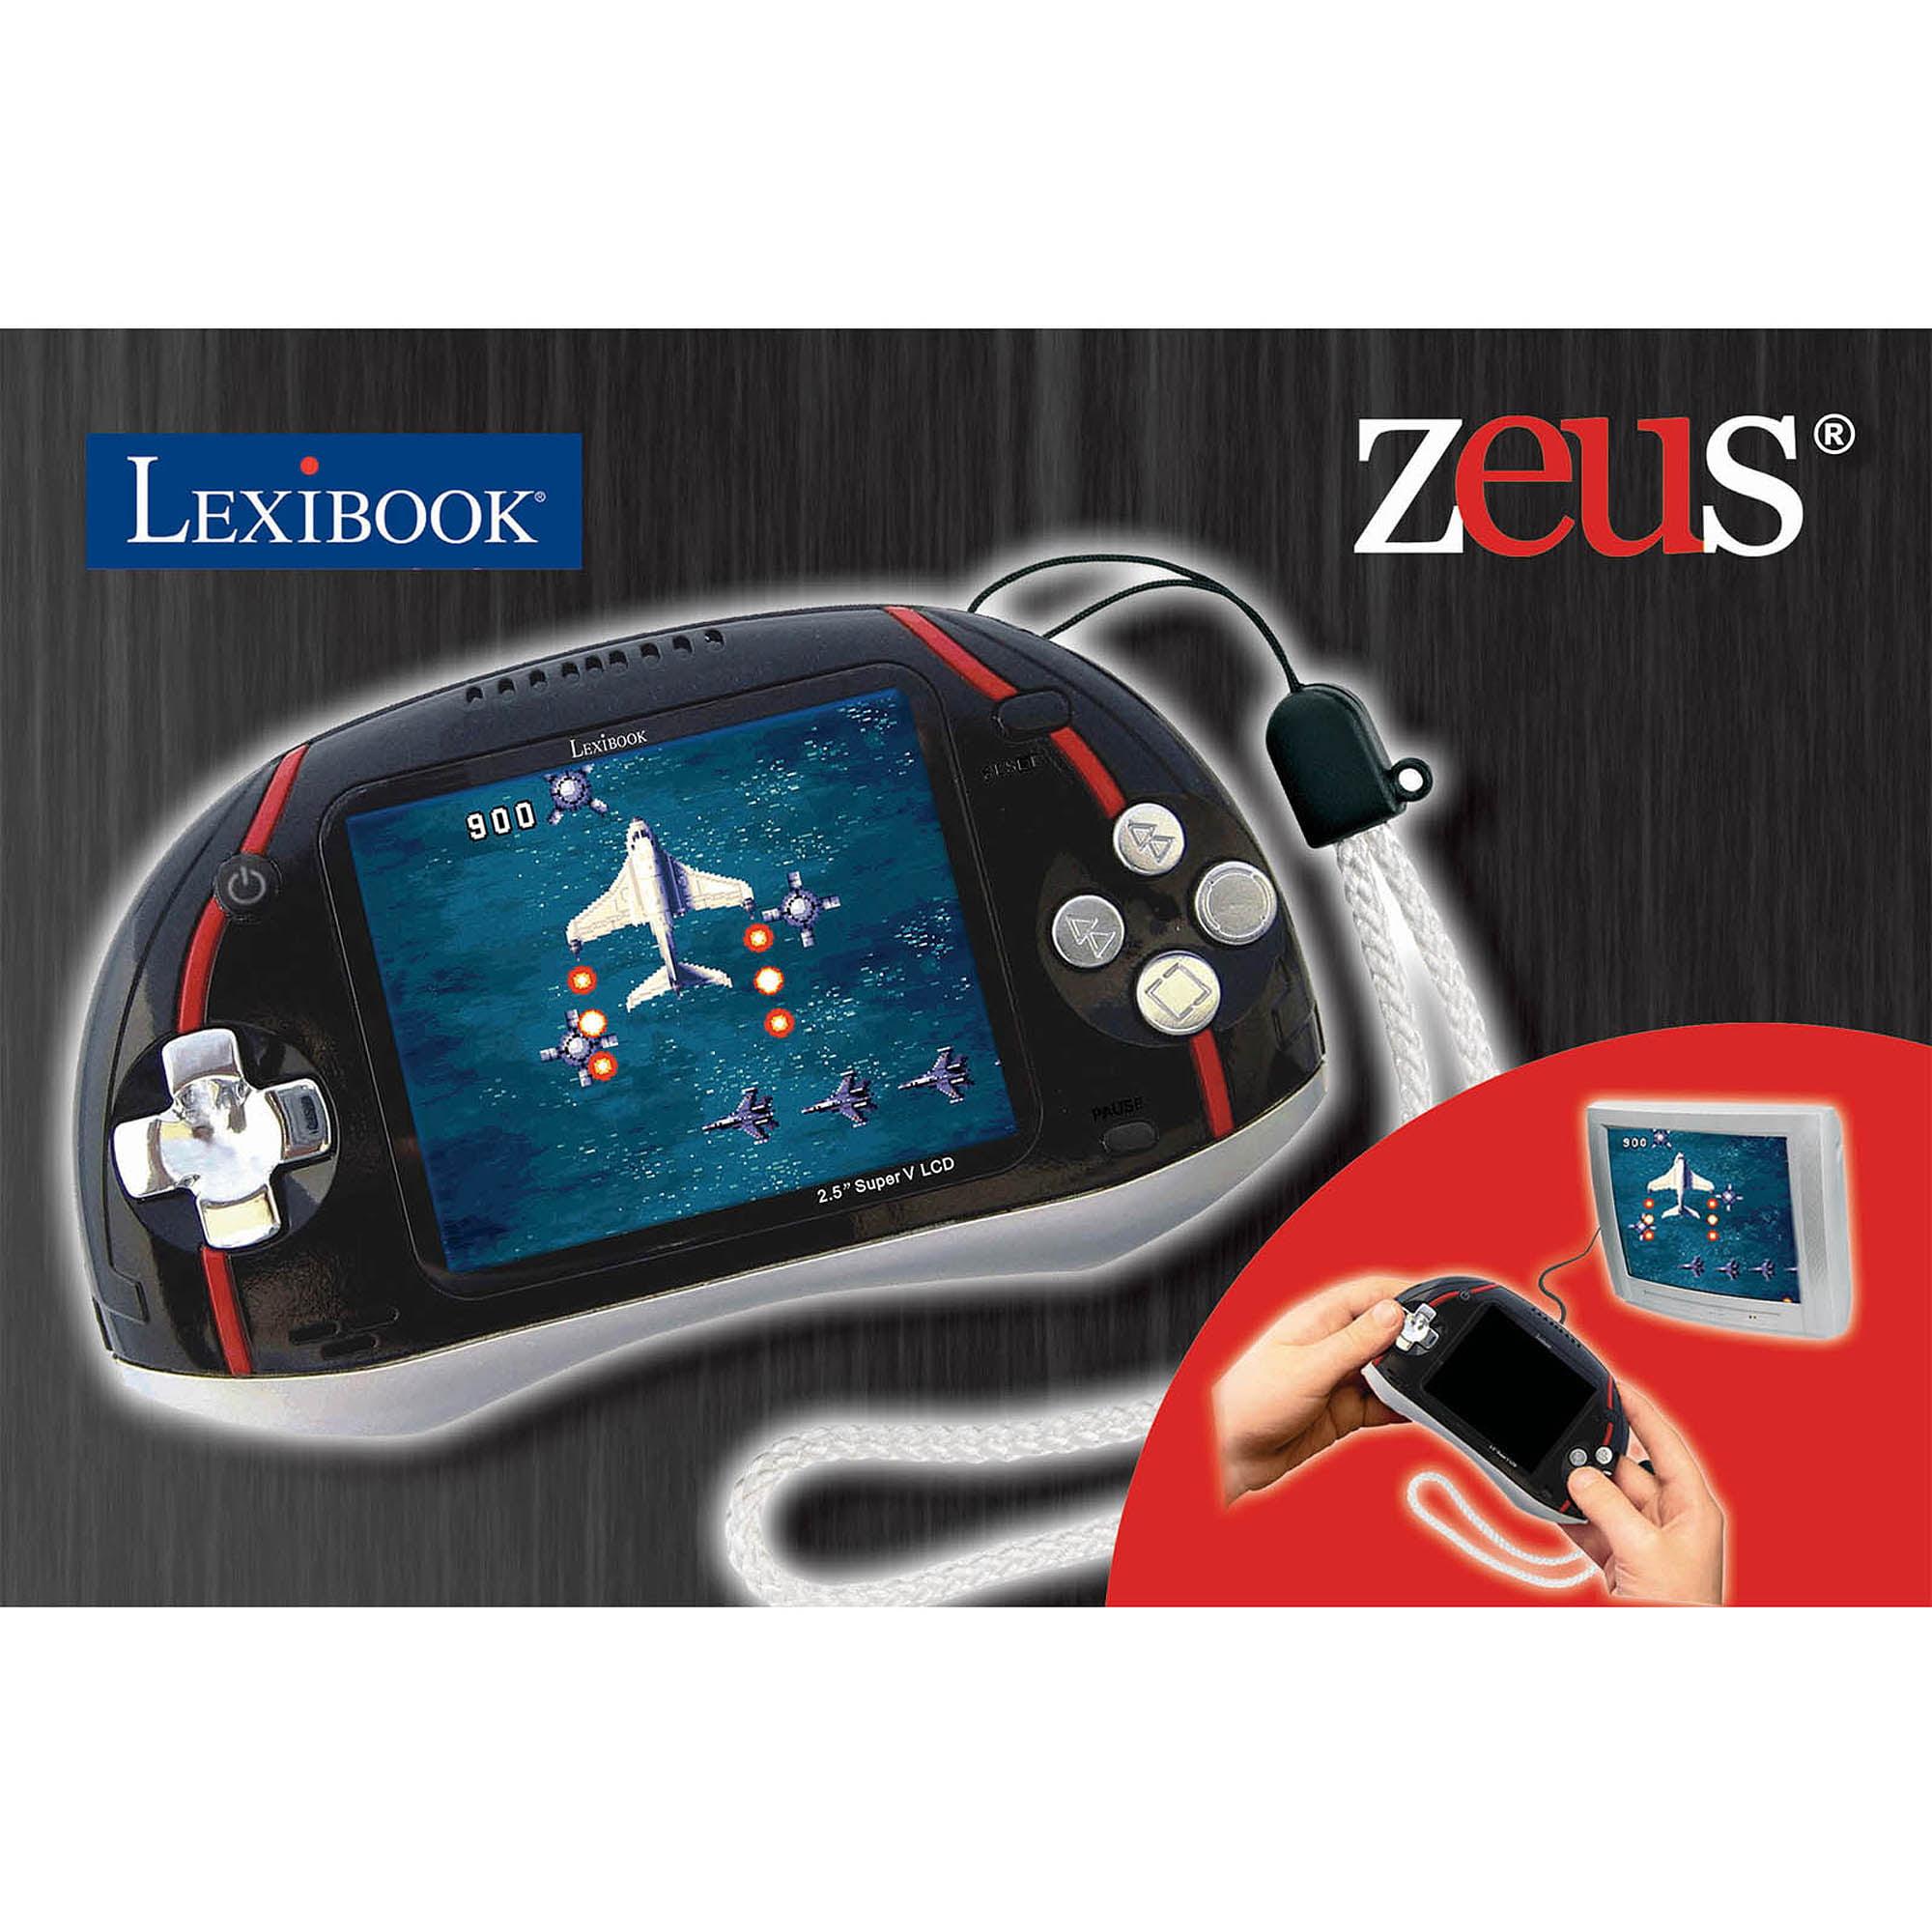 Zeus Console - IG900US